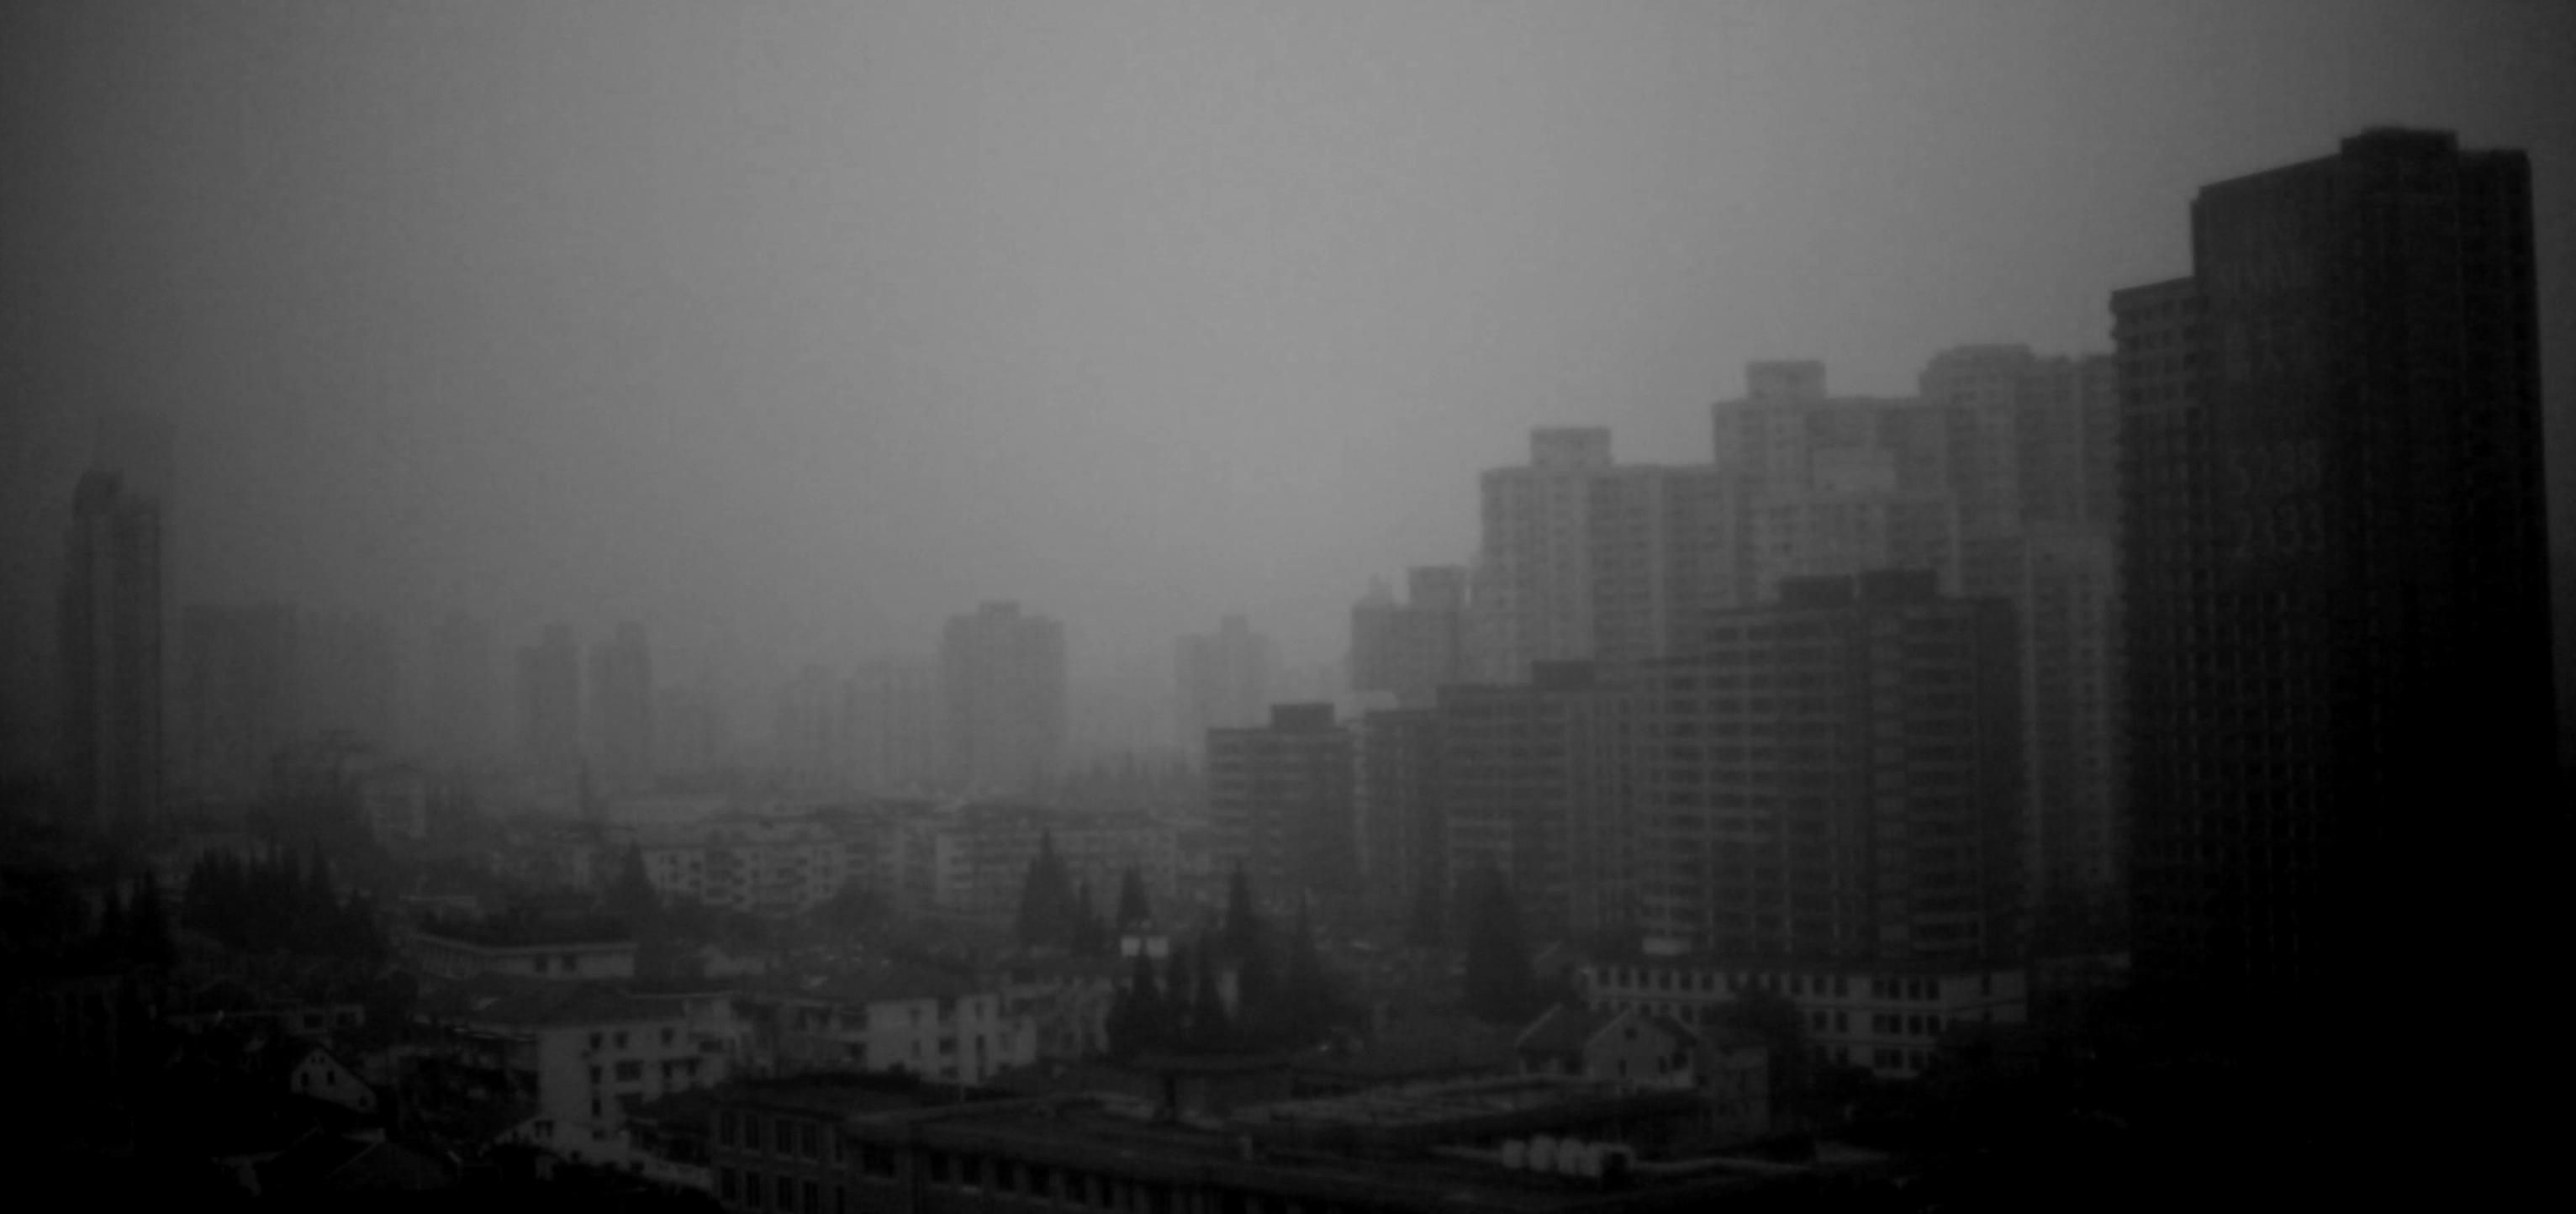 Potemkin skyline